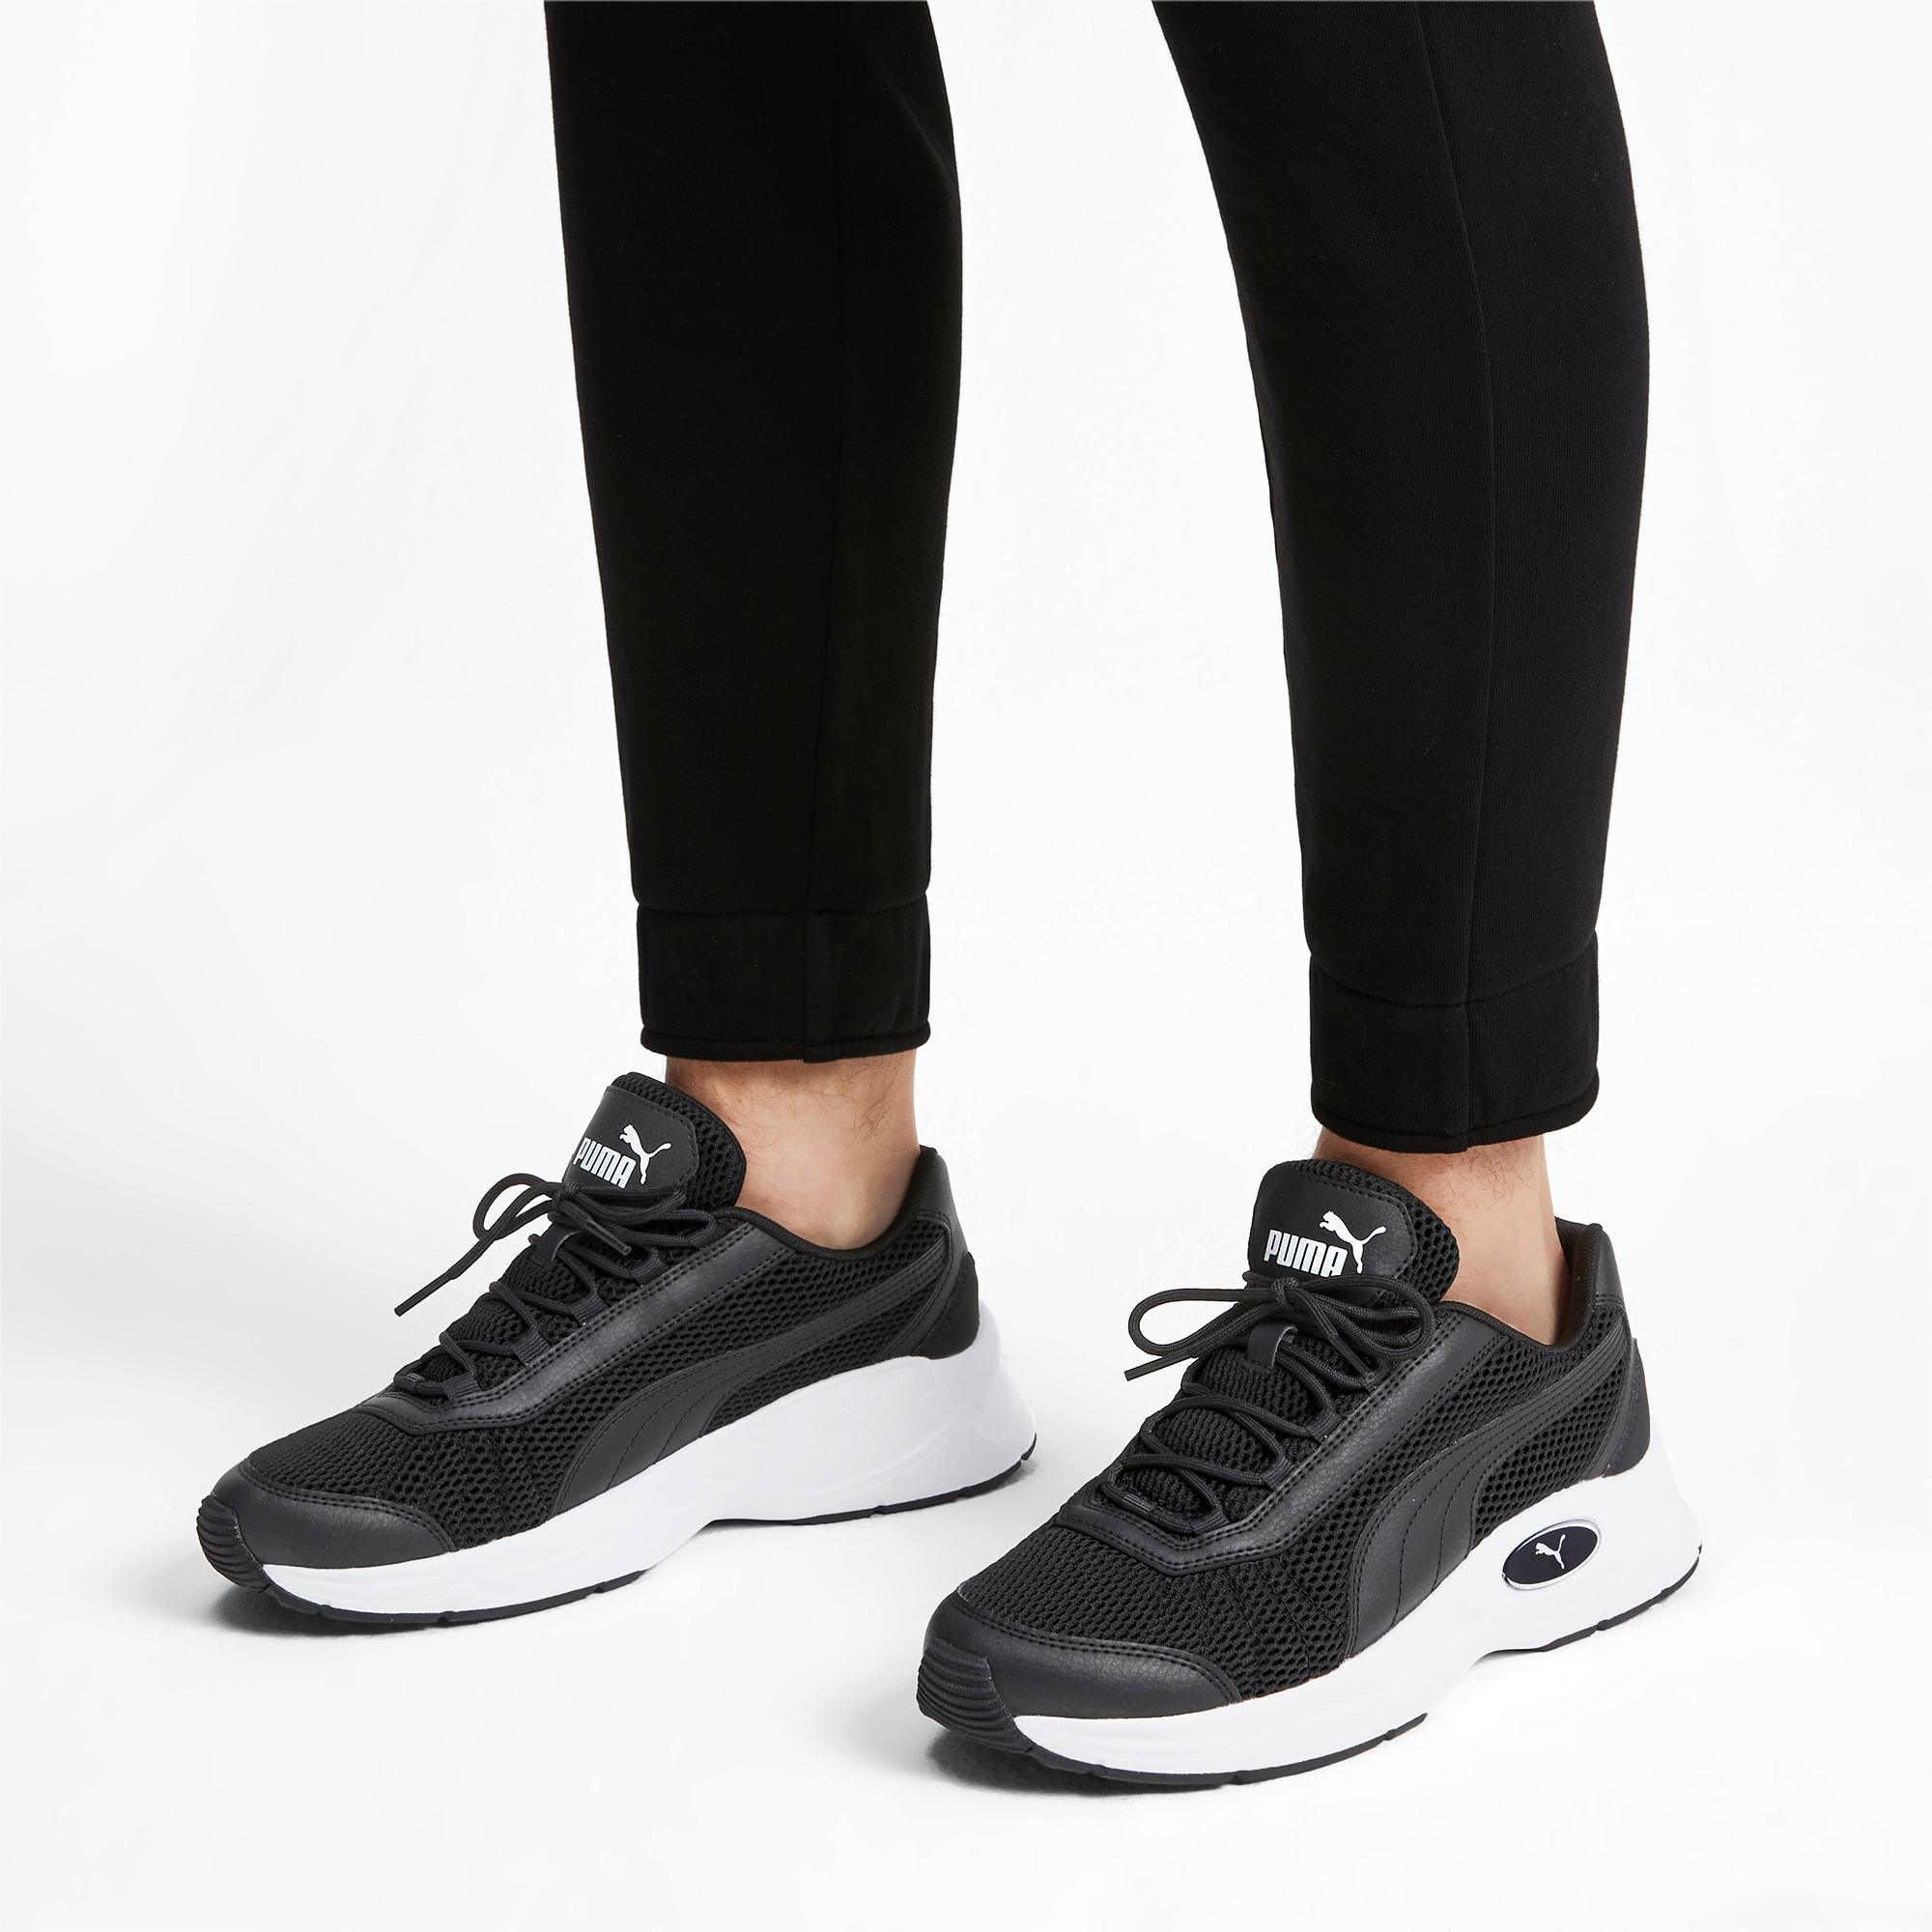 Puma Mens Nucleus Snr 02 Black White Trainers Sports Shoes